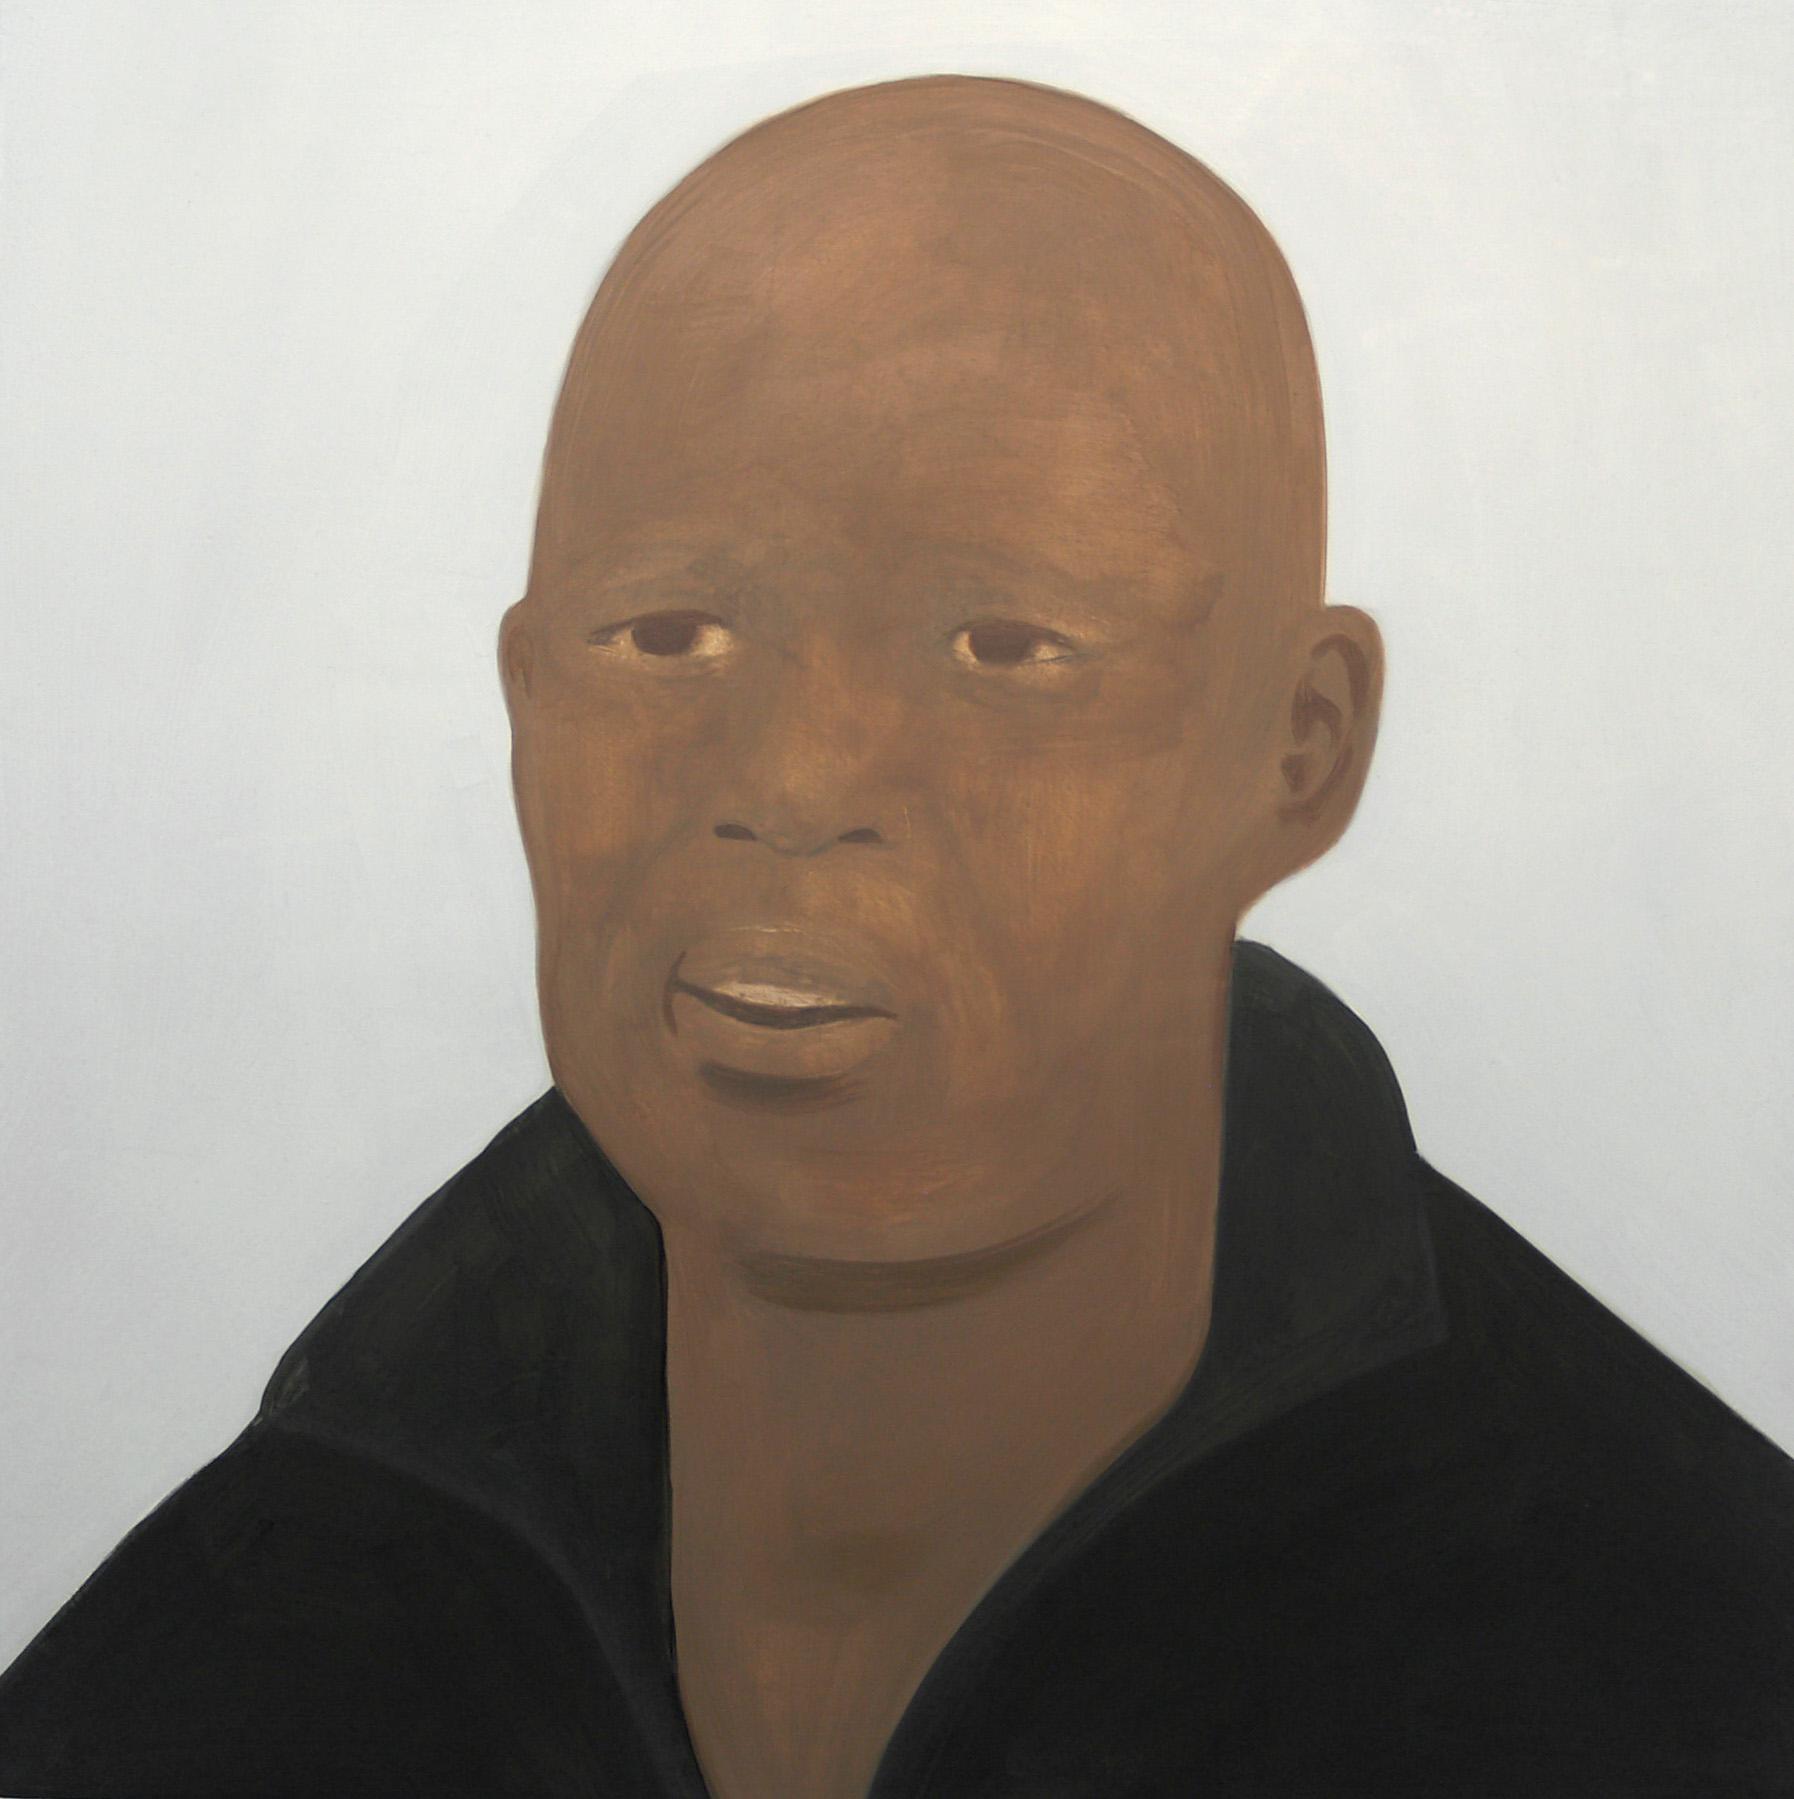 Sibolile,  Oil on canvas, 50 x 50 cm, 2013